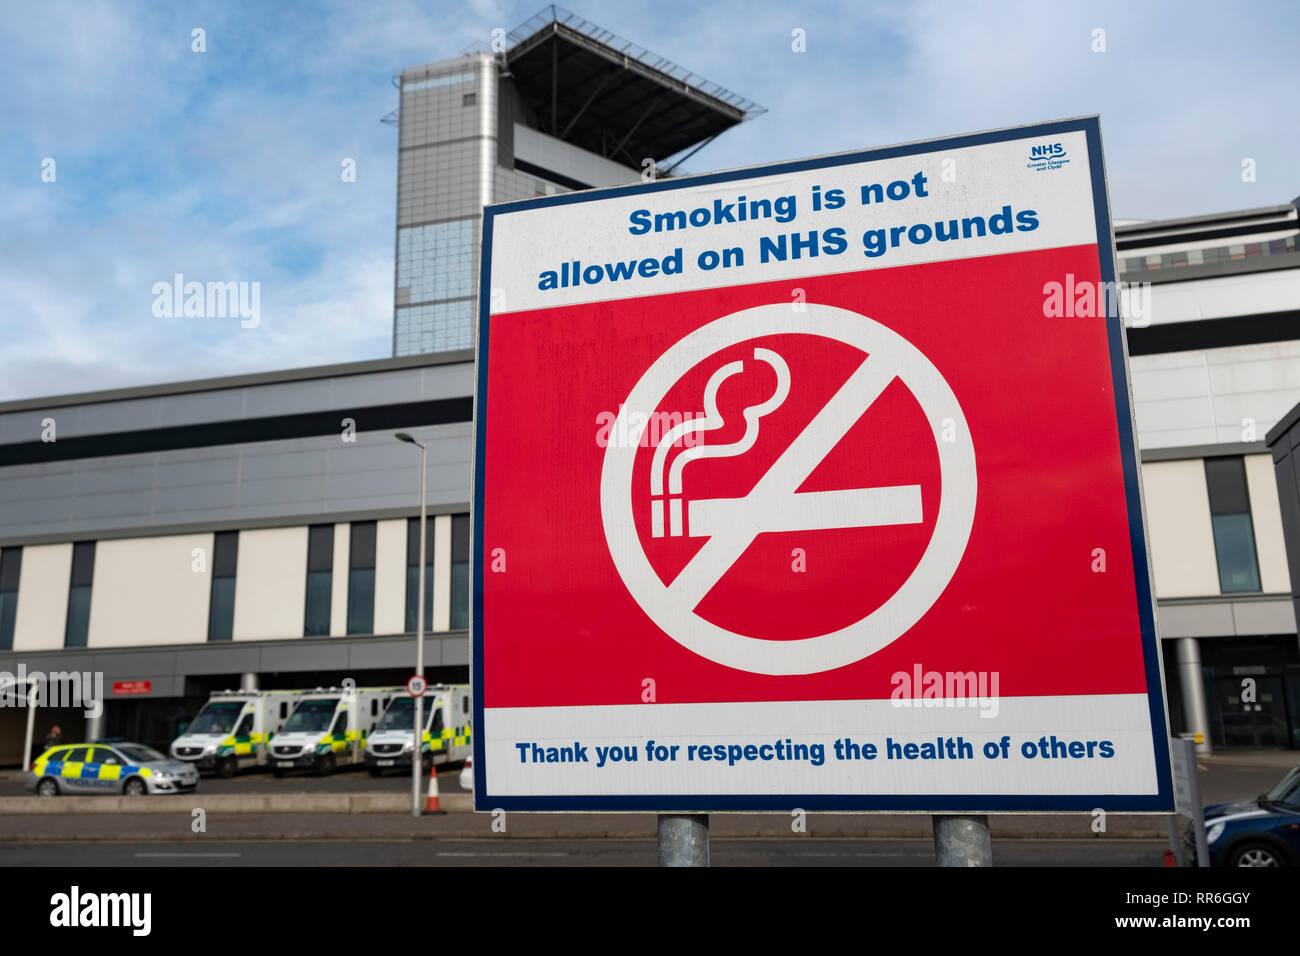 No smoking sign in outdoor area at Queen Elizabeth University Hospital in Glasgow, Scotland, UK - Stock Image